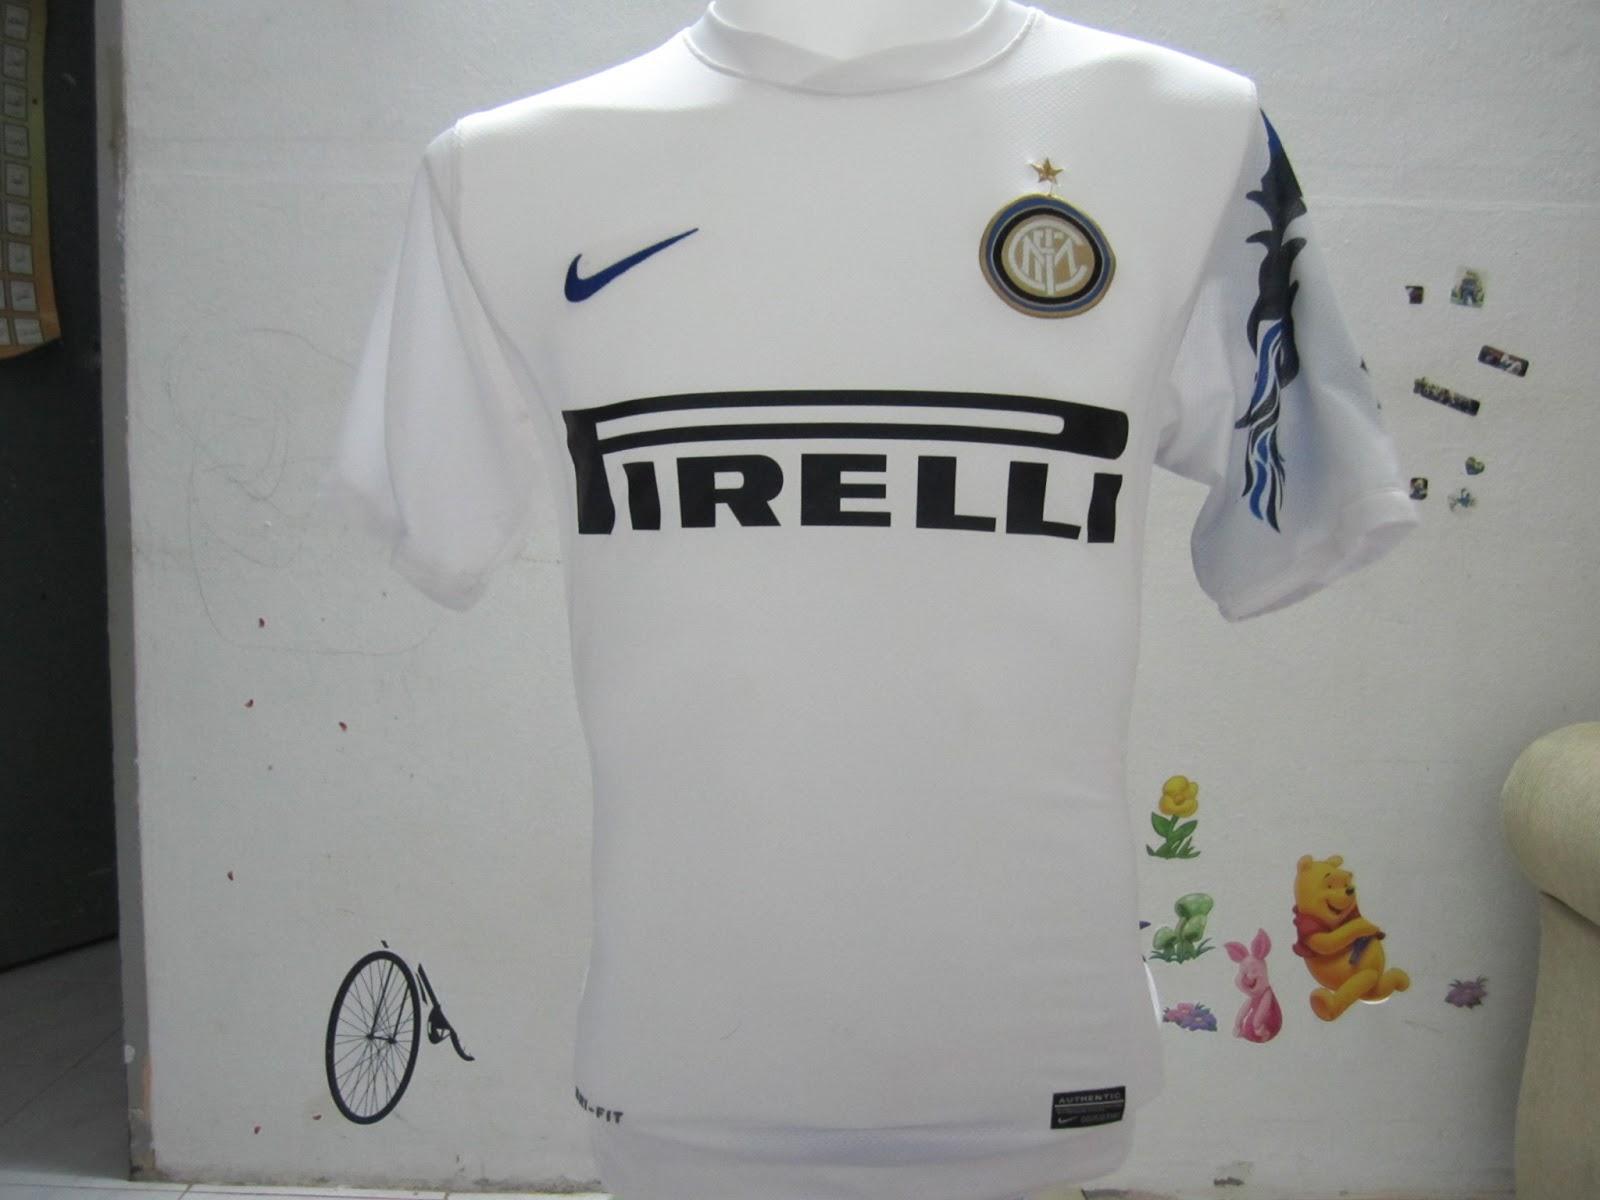 info for 953a6 4f90b BundleWalla: Inter Milan Away Dragon Jersey 2010 A SOLD